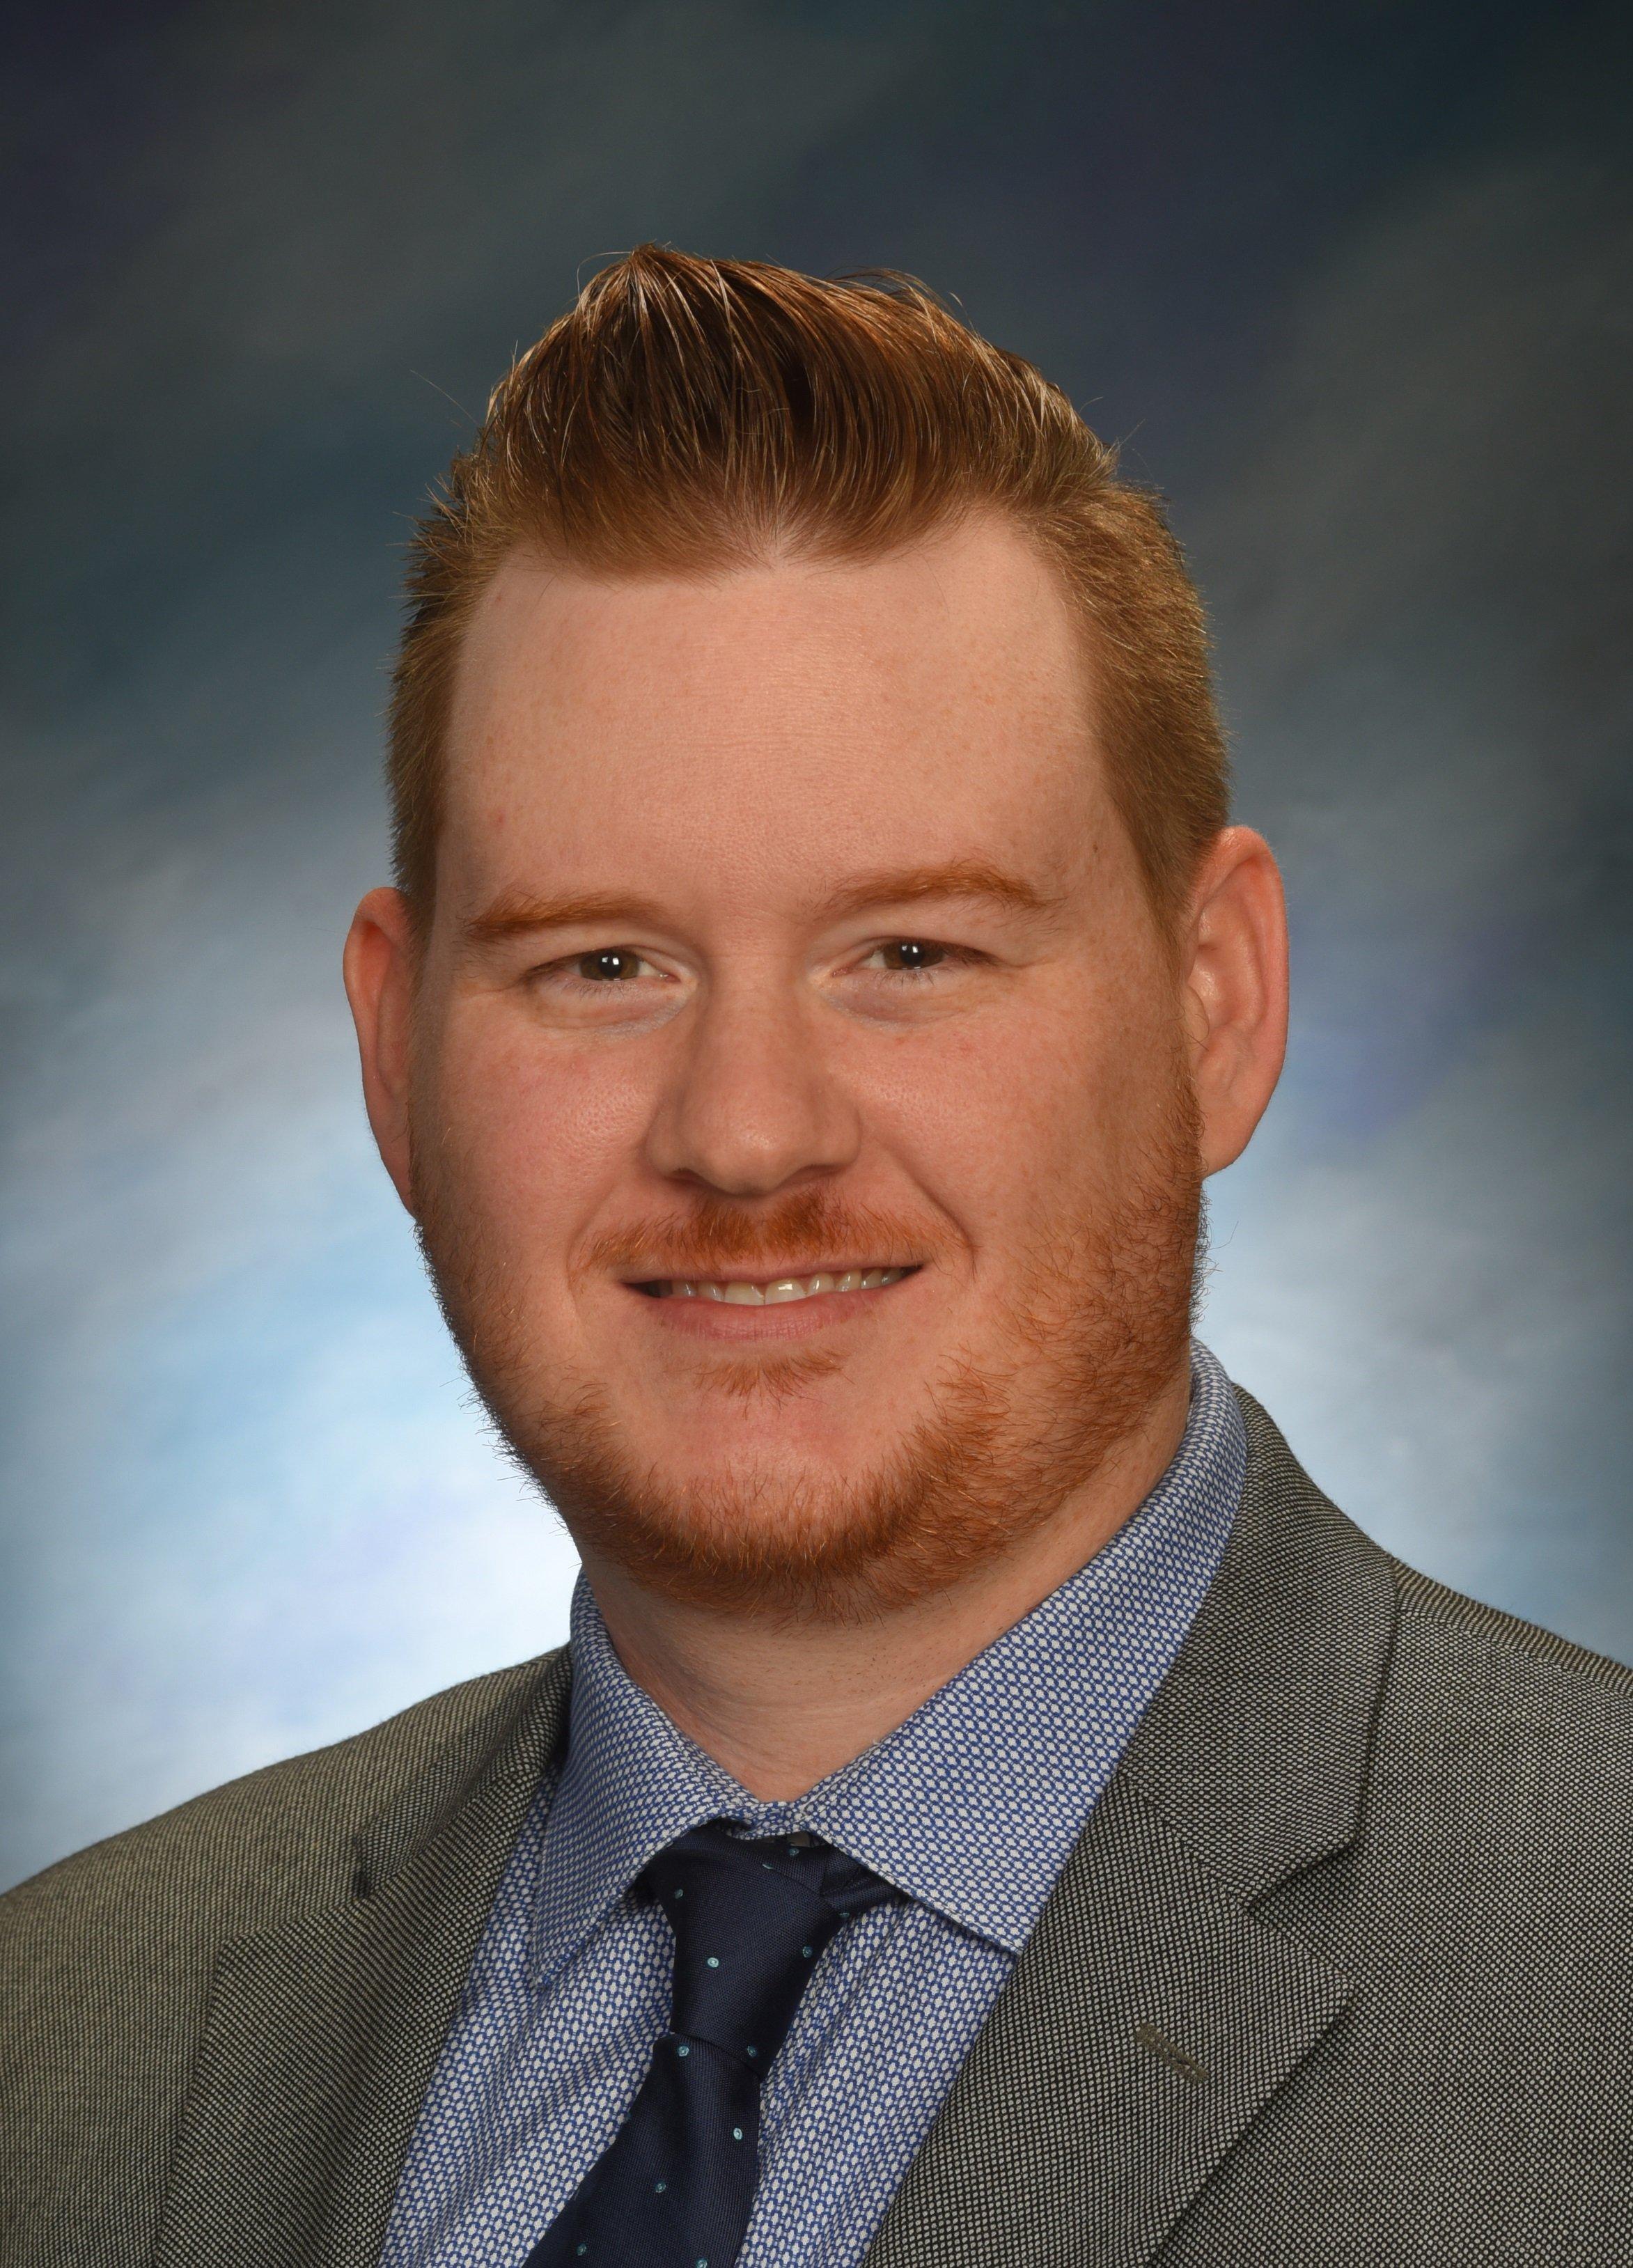 Brian Doherty, Executive Director of Sales